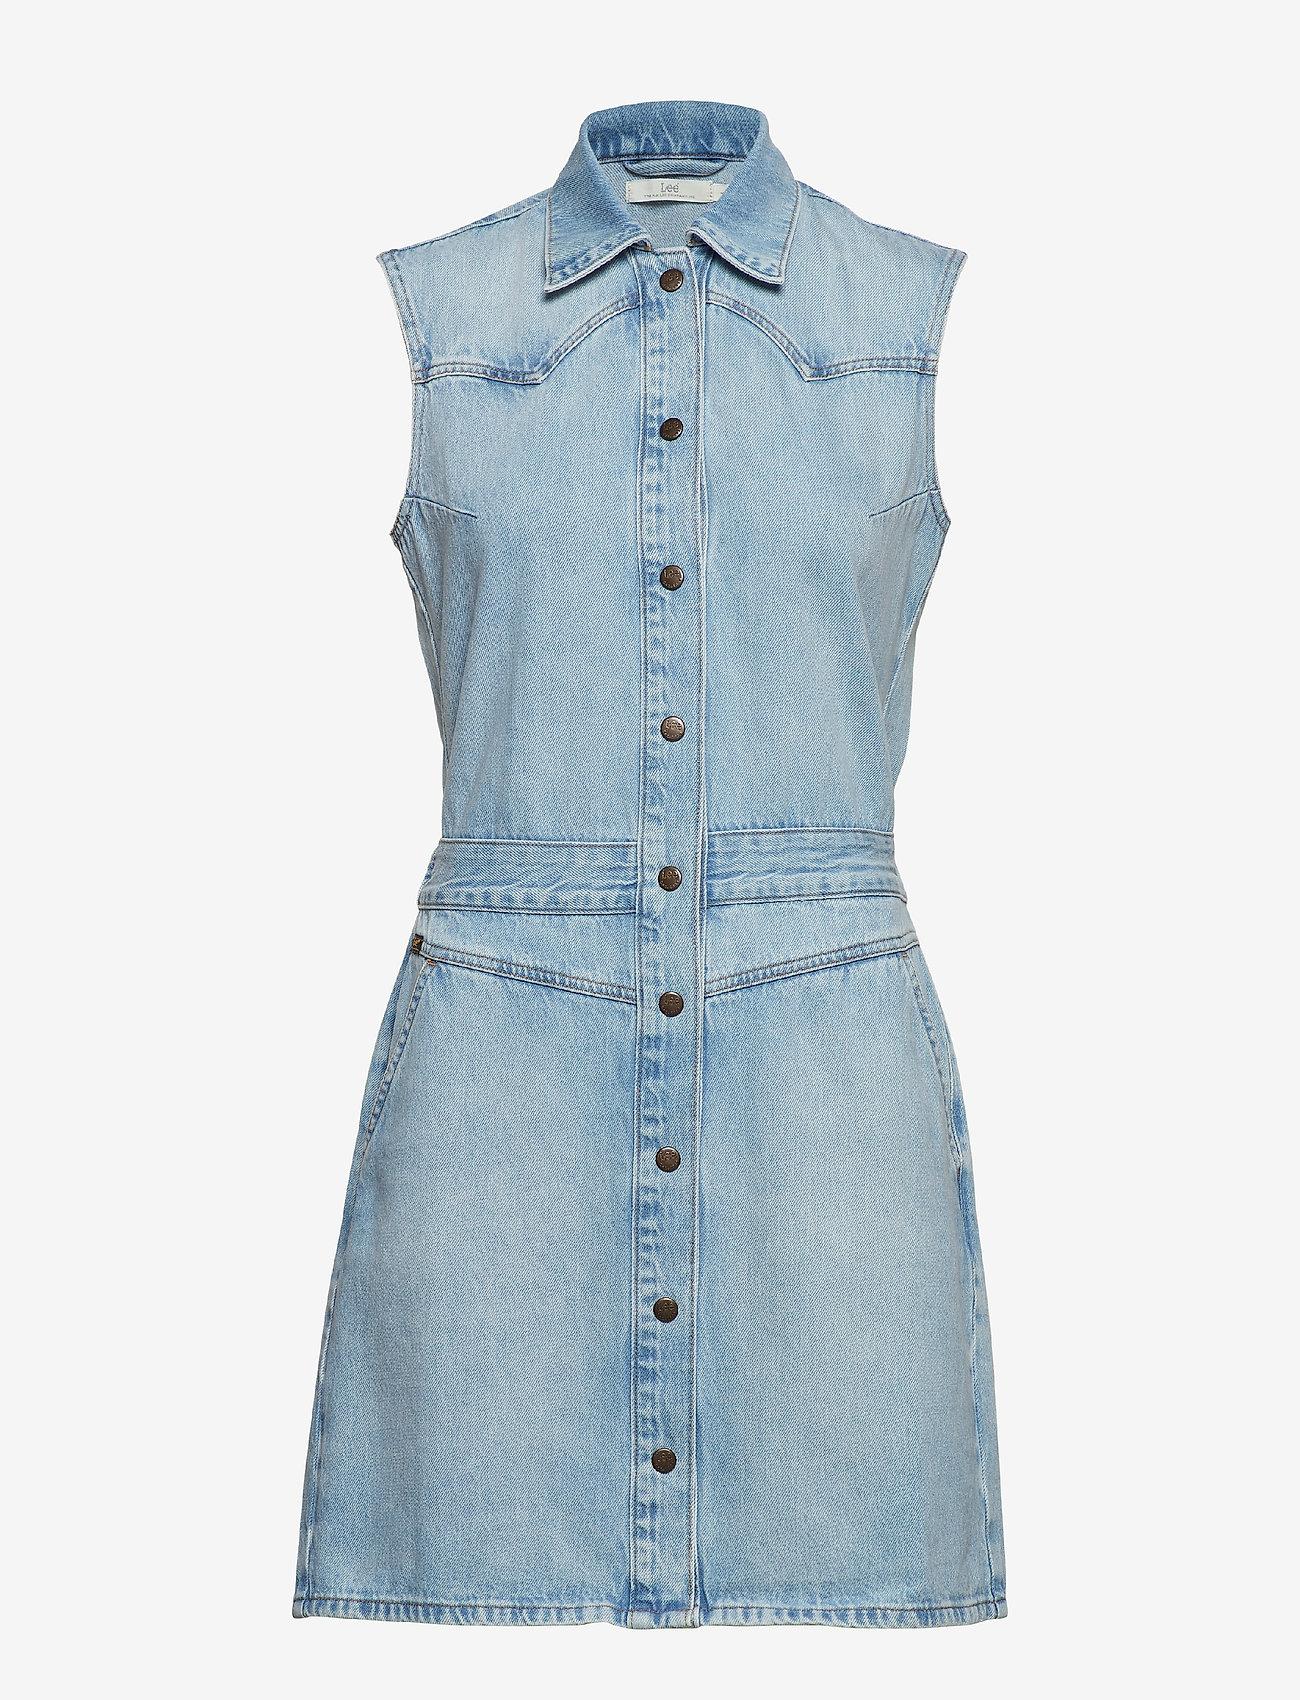 Lee Jeans - MOM DRESS - shirt dresses - get light